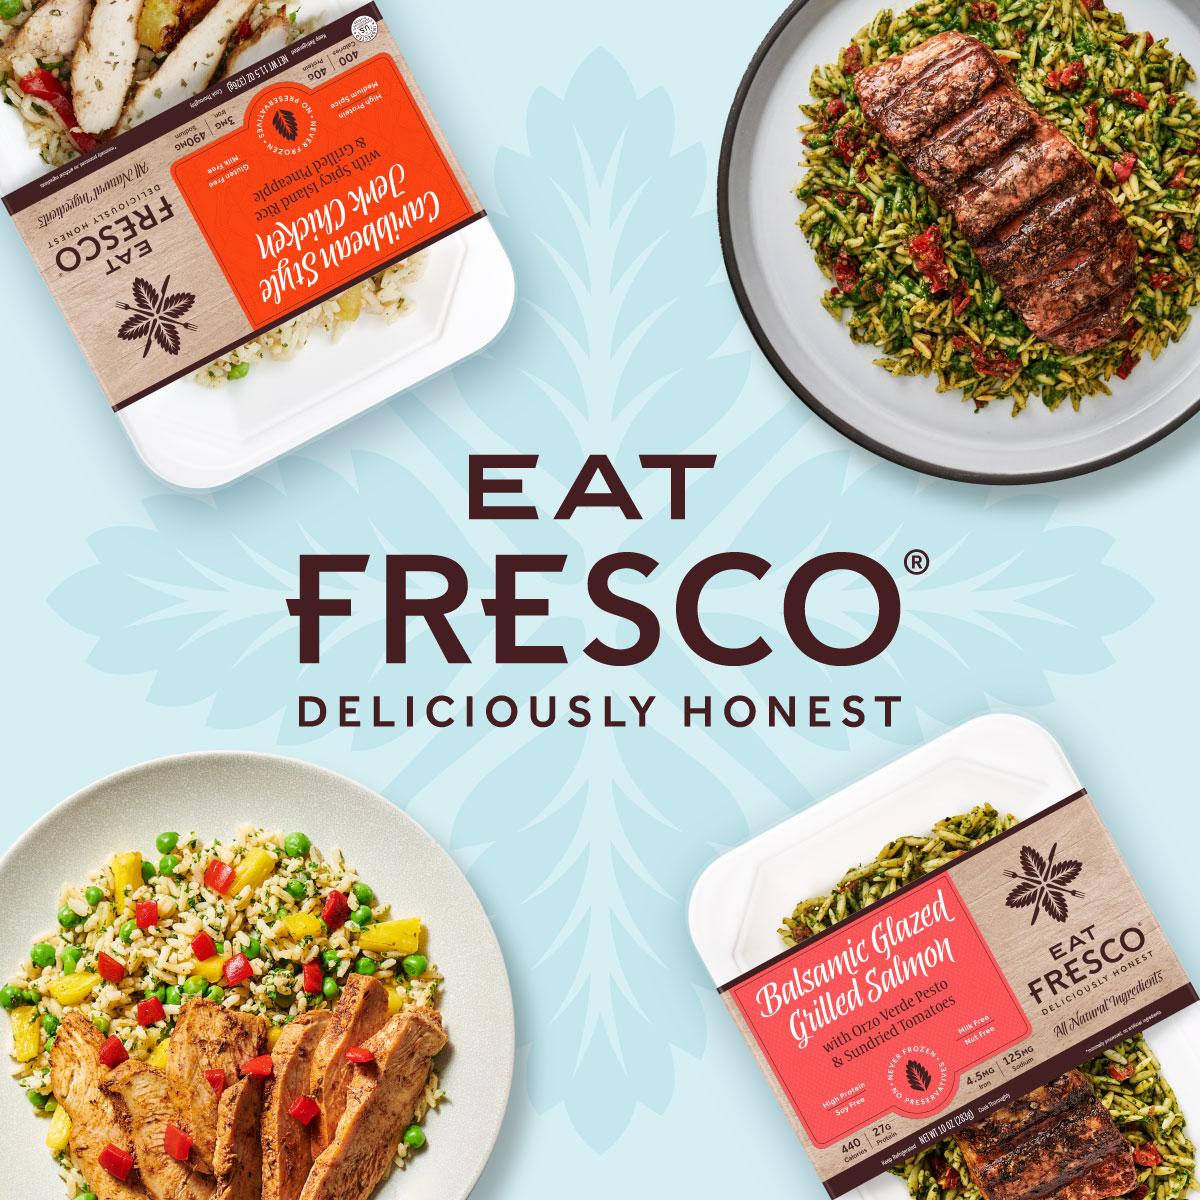 Eat Fresco | Deliciously Honest